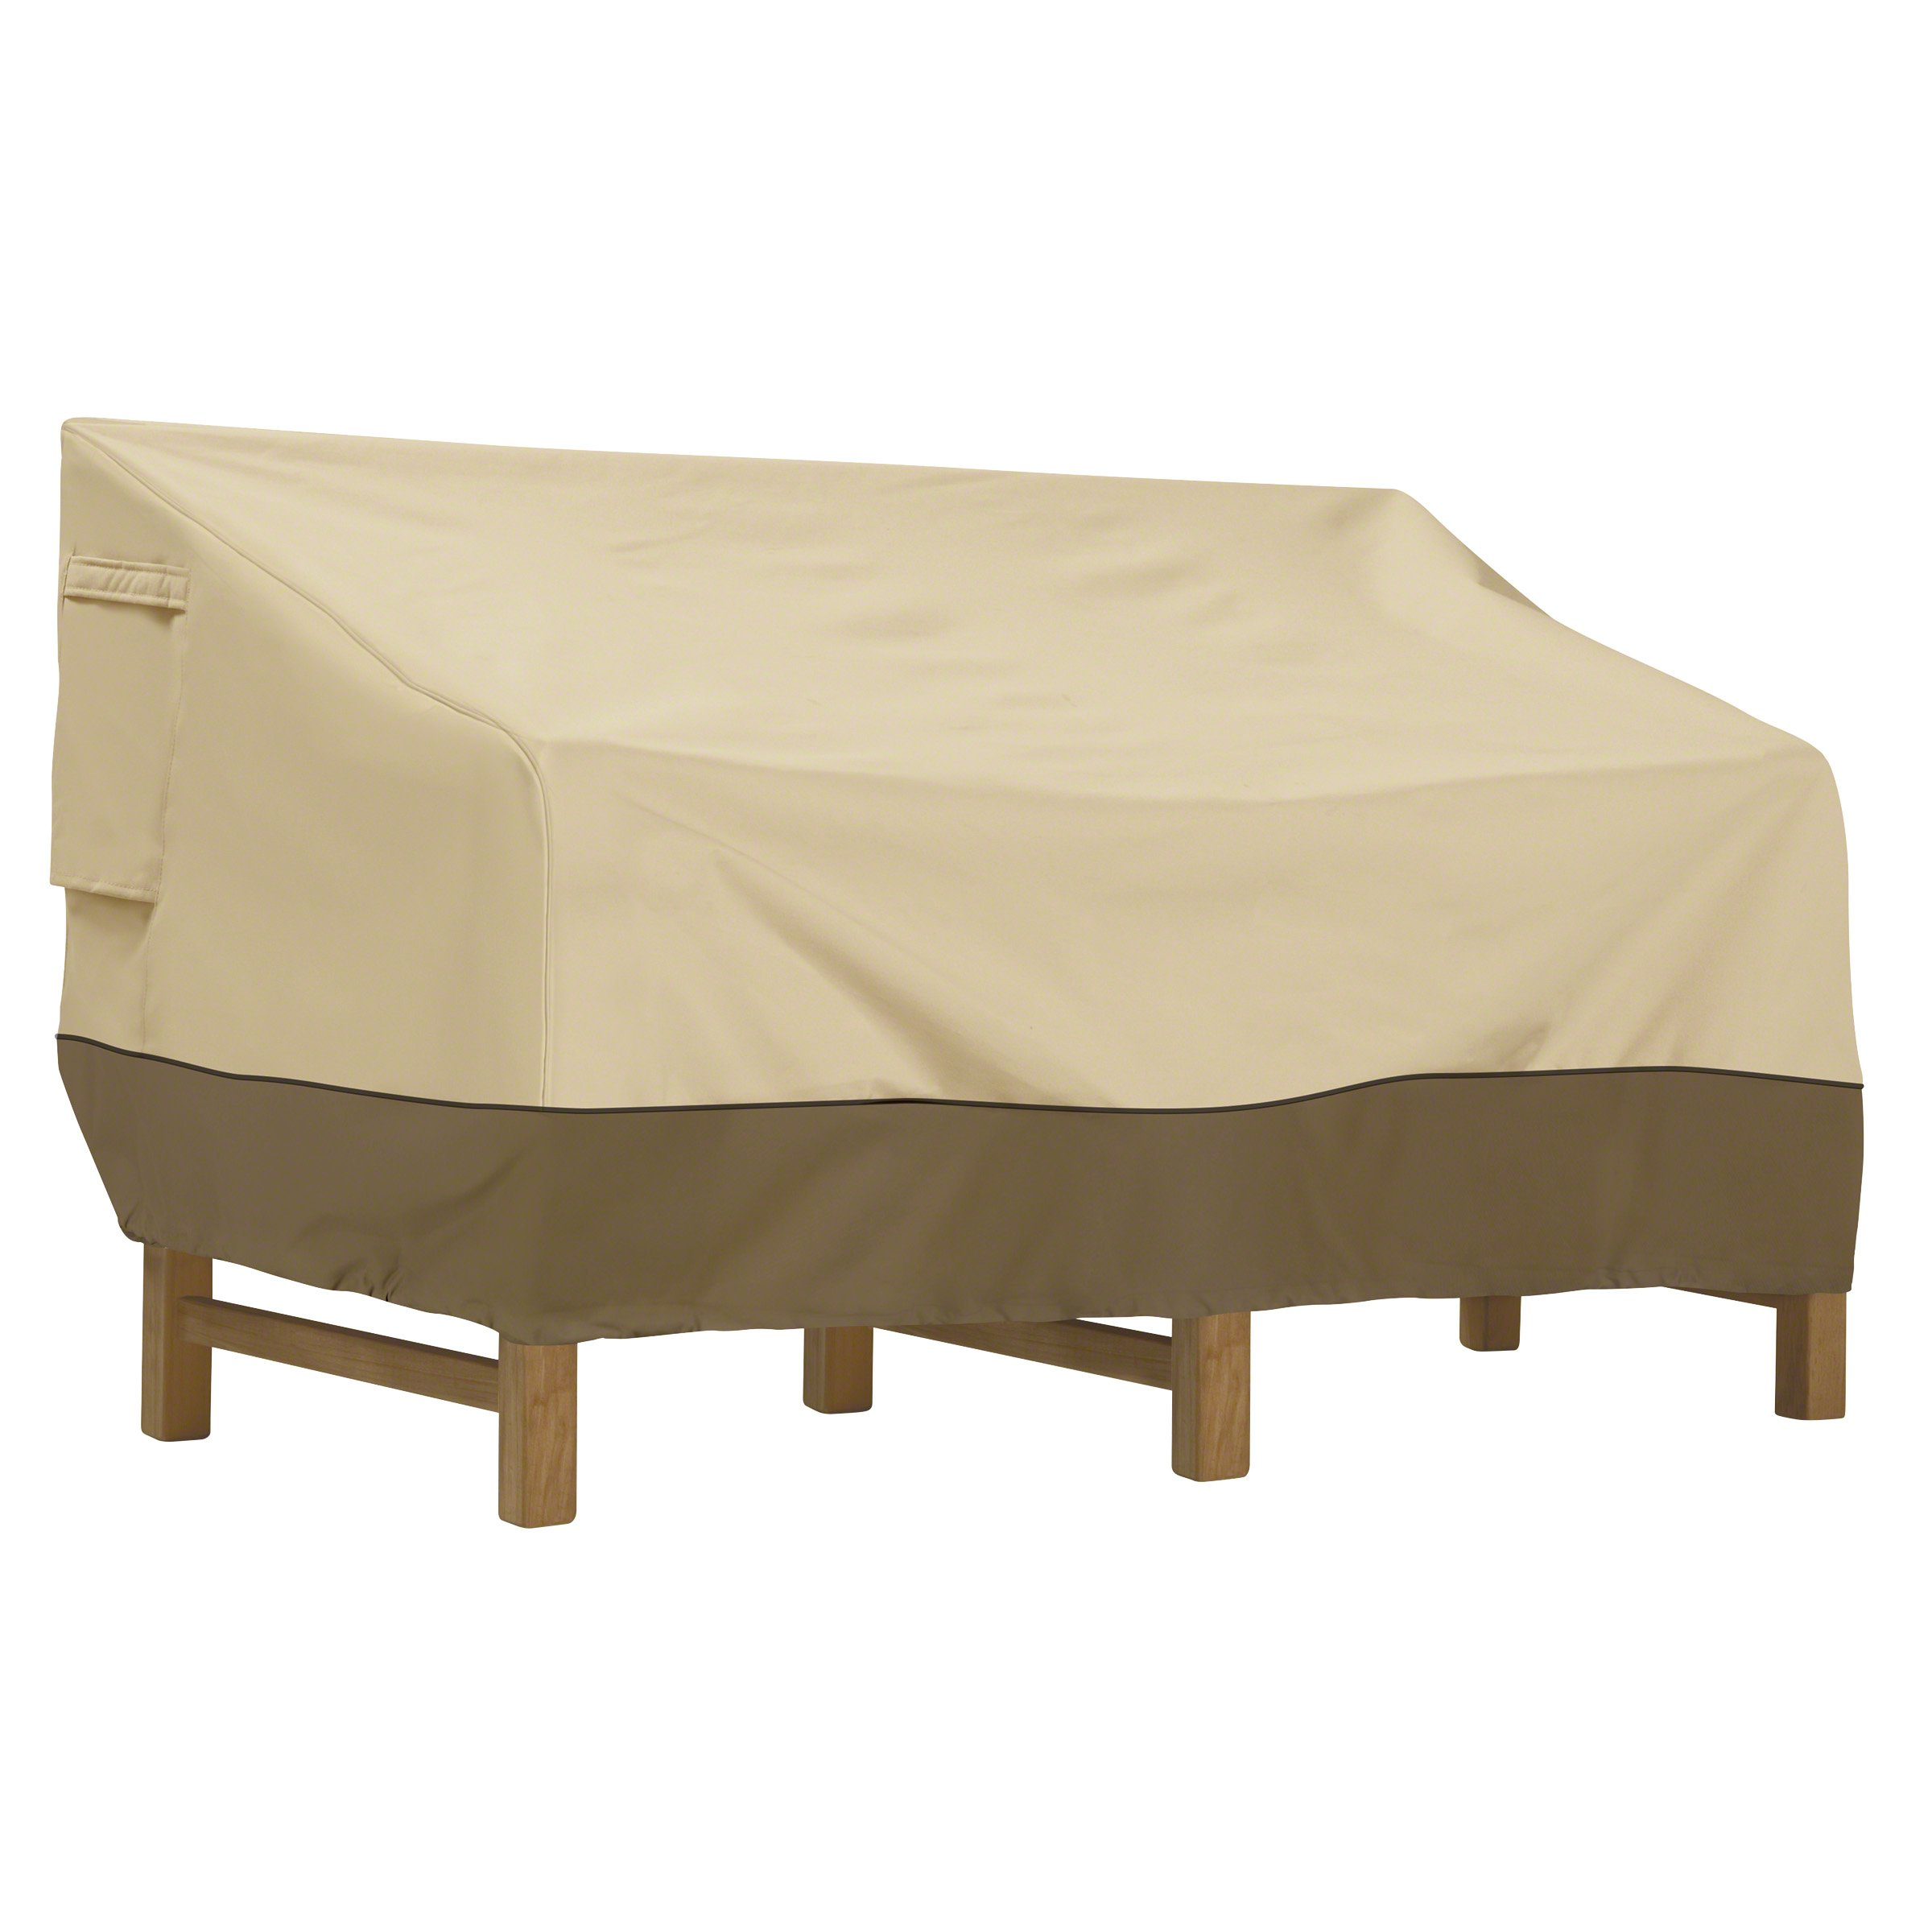 Classic Accessories Veranda Patio Deep Seat Sofa Cover, Large by Classic Accessories